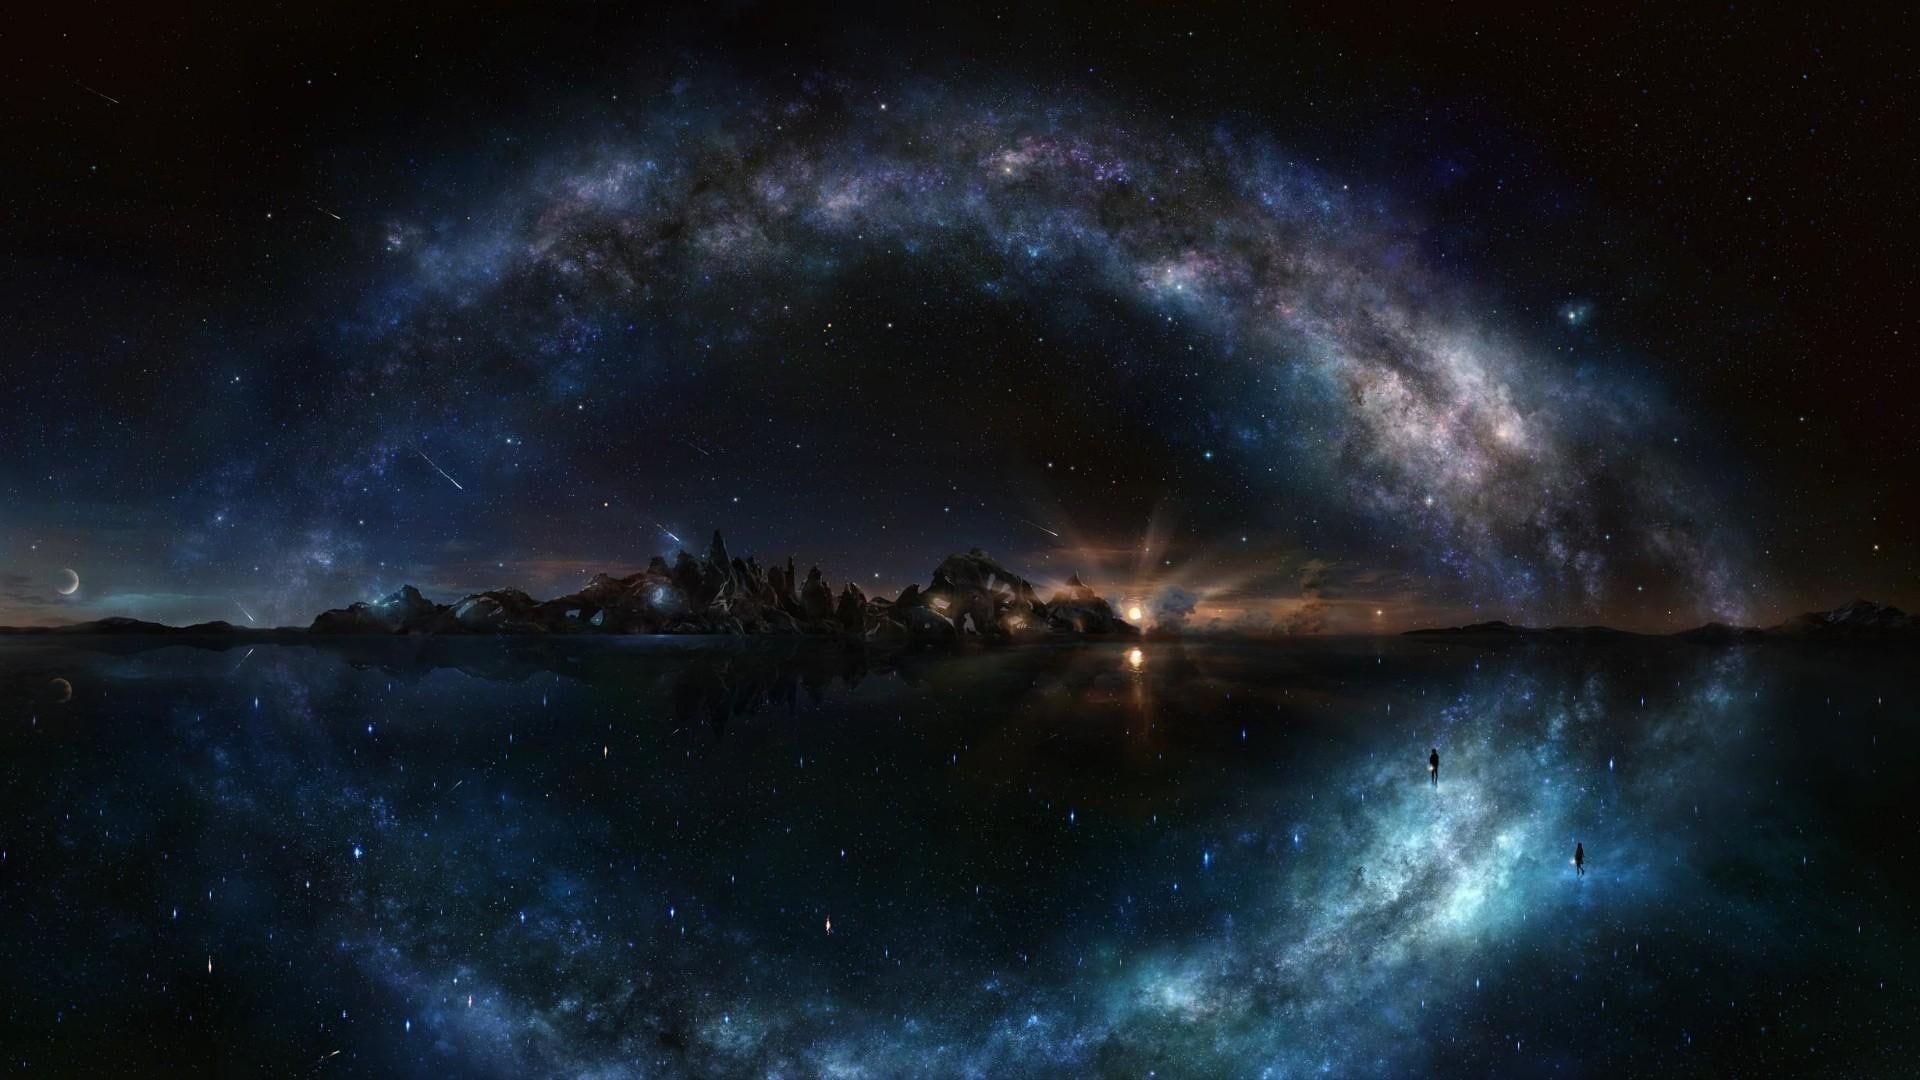 Milky Way Starry Starry Night Night Sky Night Reflected Reflection Reflect 1080p Wallpaper Hdwallpaper Desktop Night Sky Wallpaper Night Skies Sky Wallpaper milky way starry night nebula